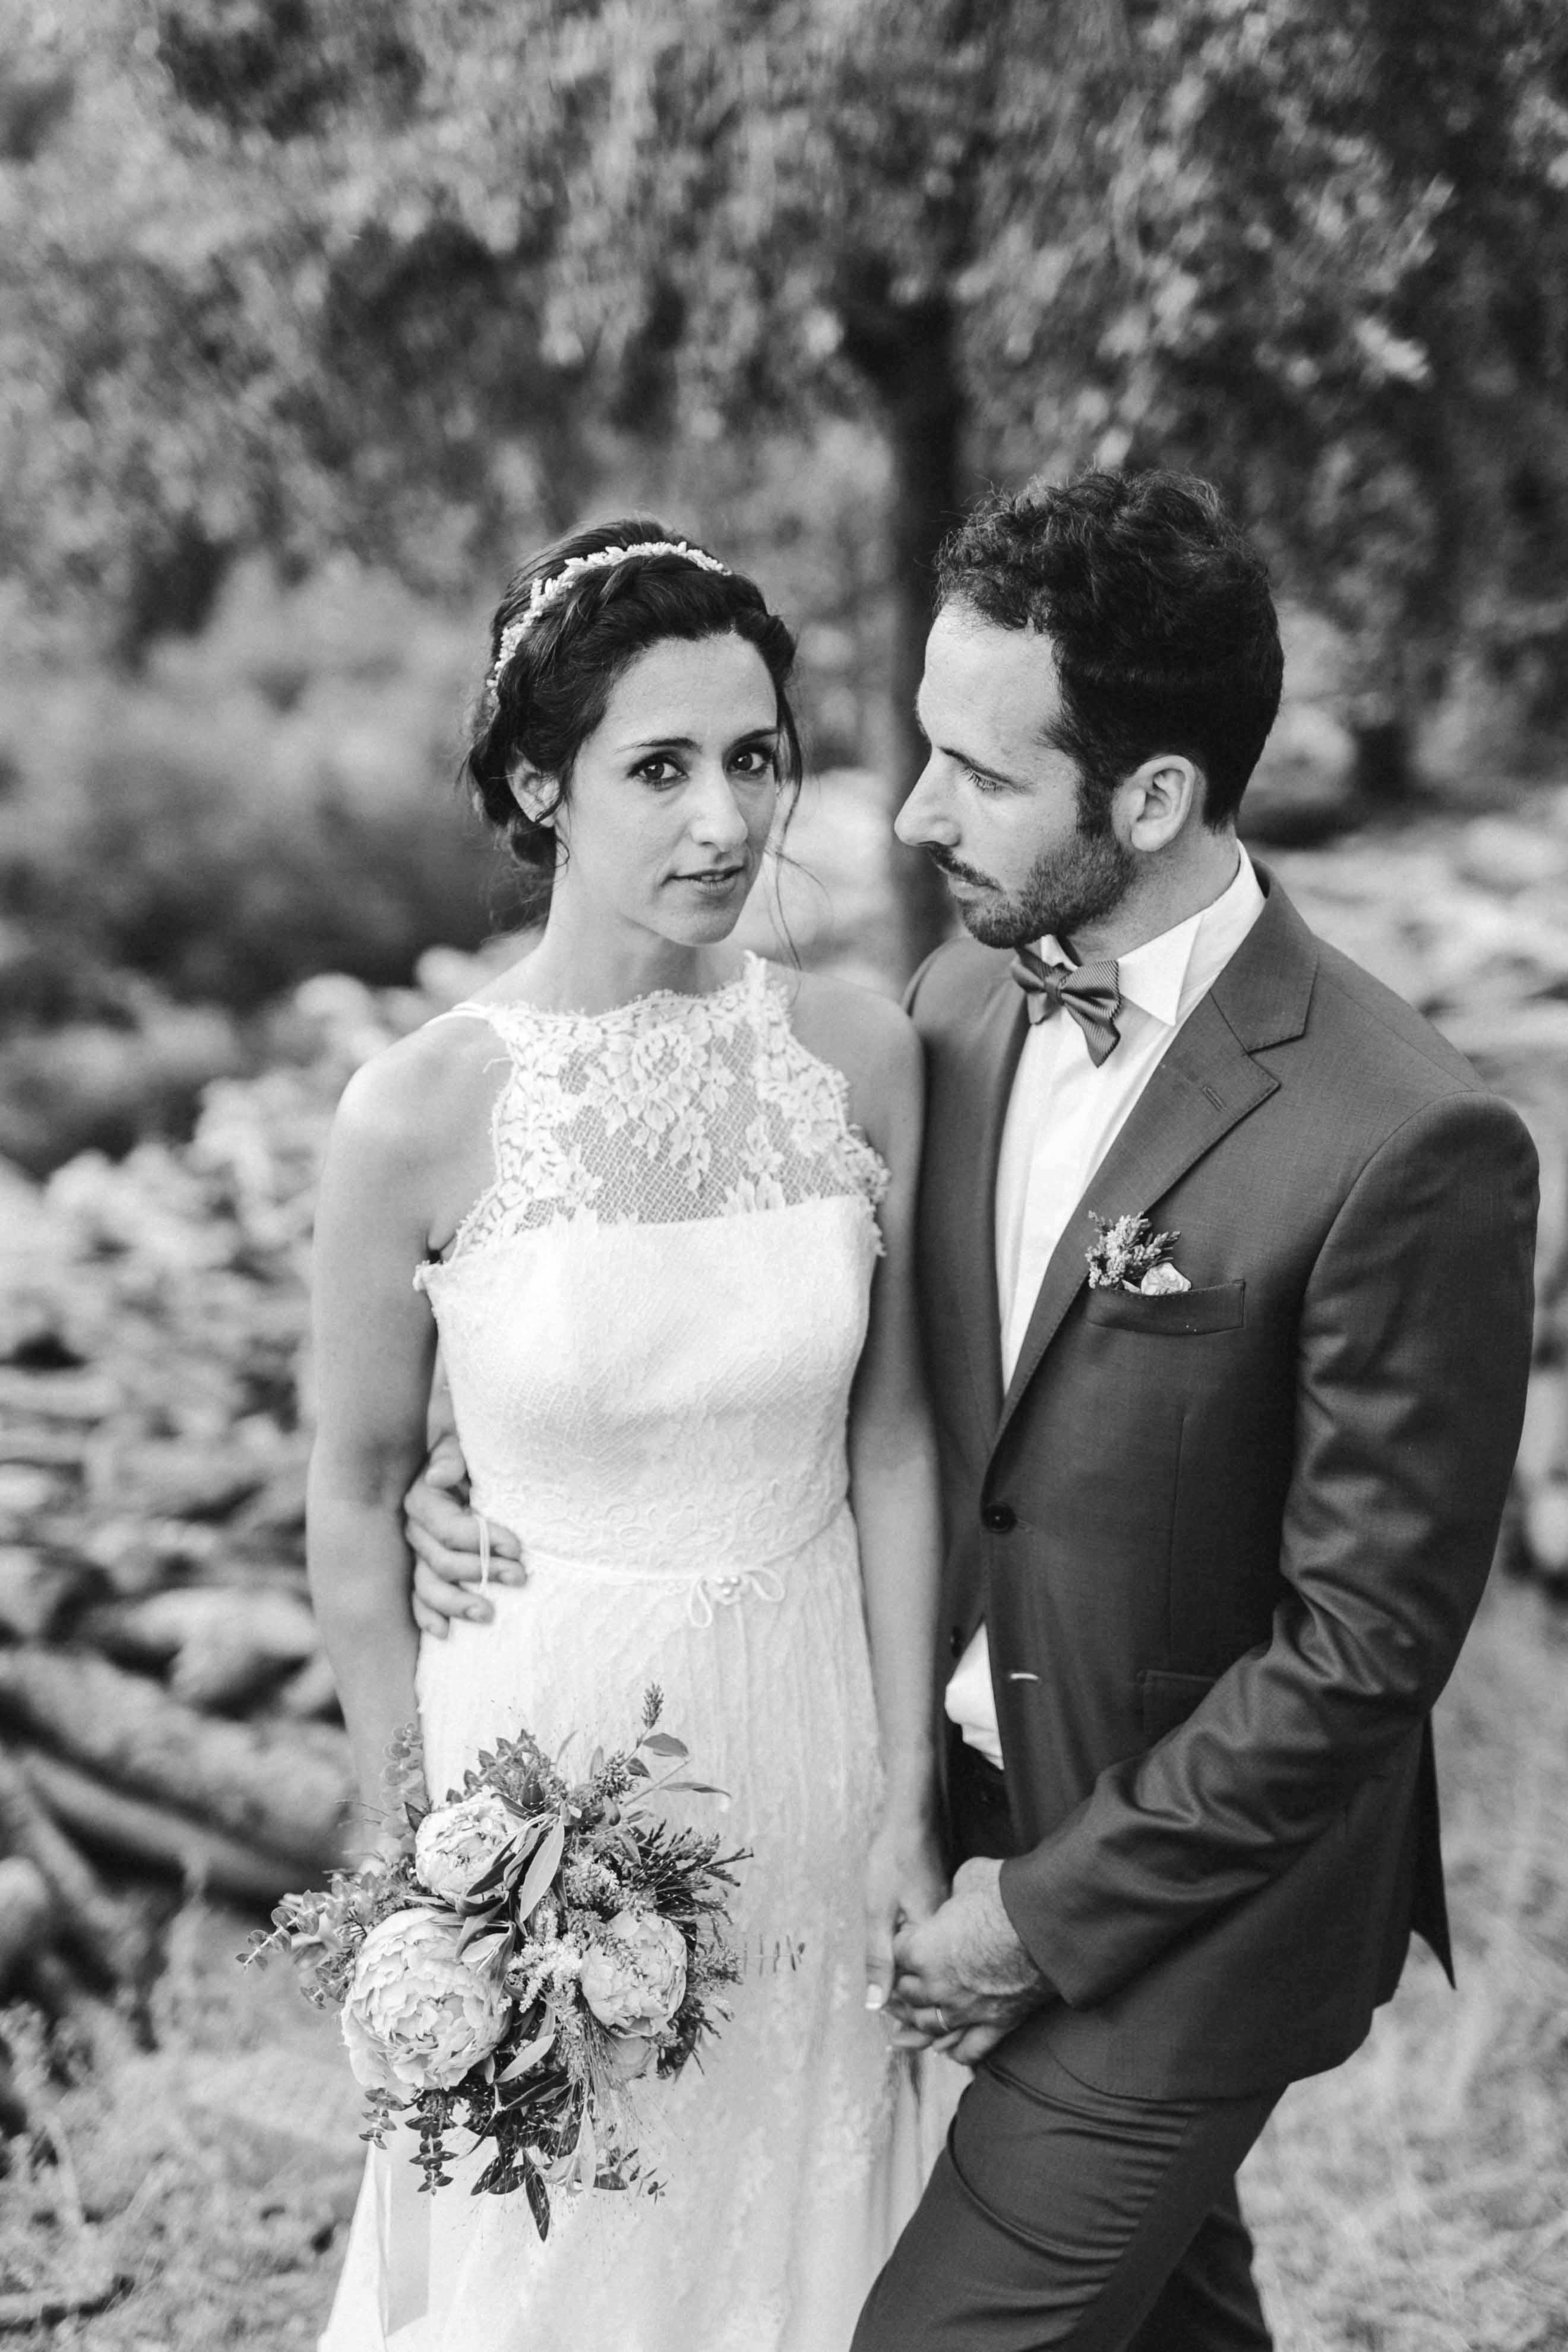 Boda rústica en la montaña. fotgrafo de bodas barcelona_078